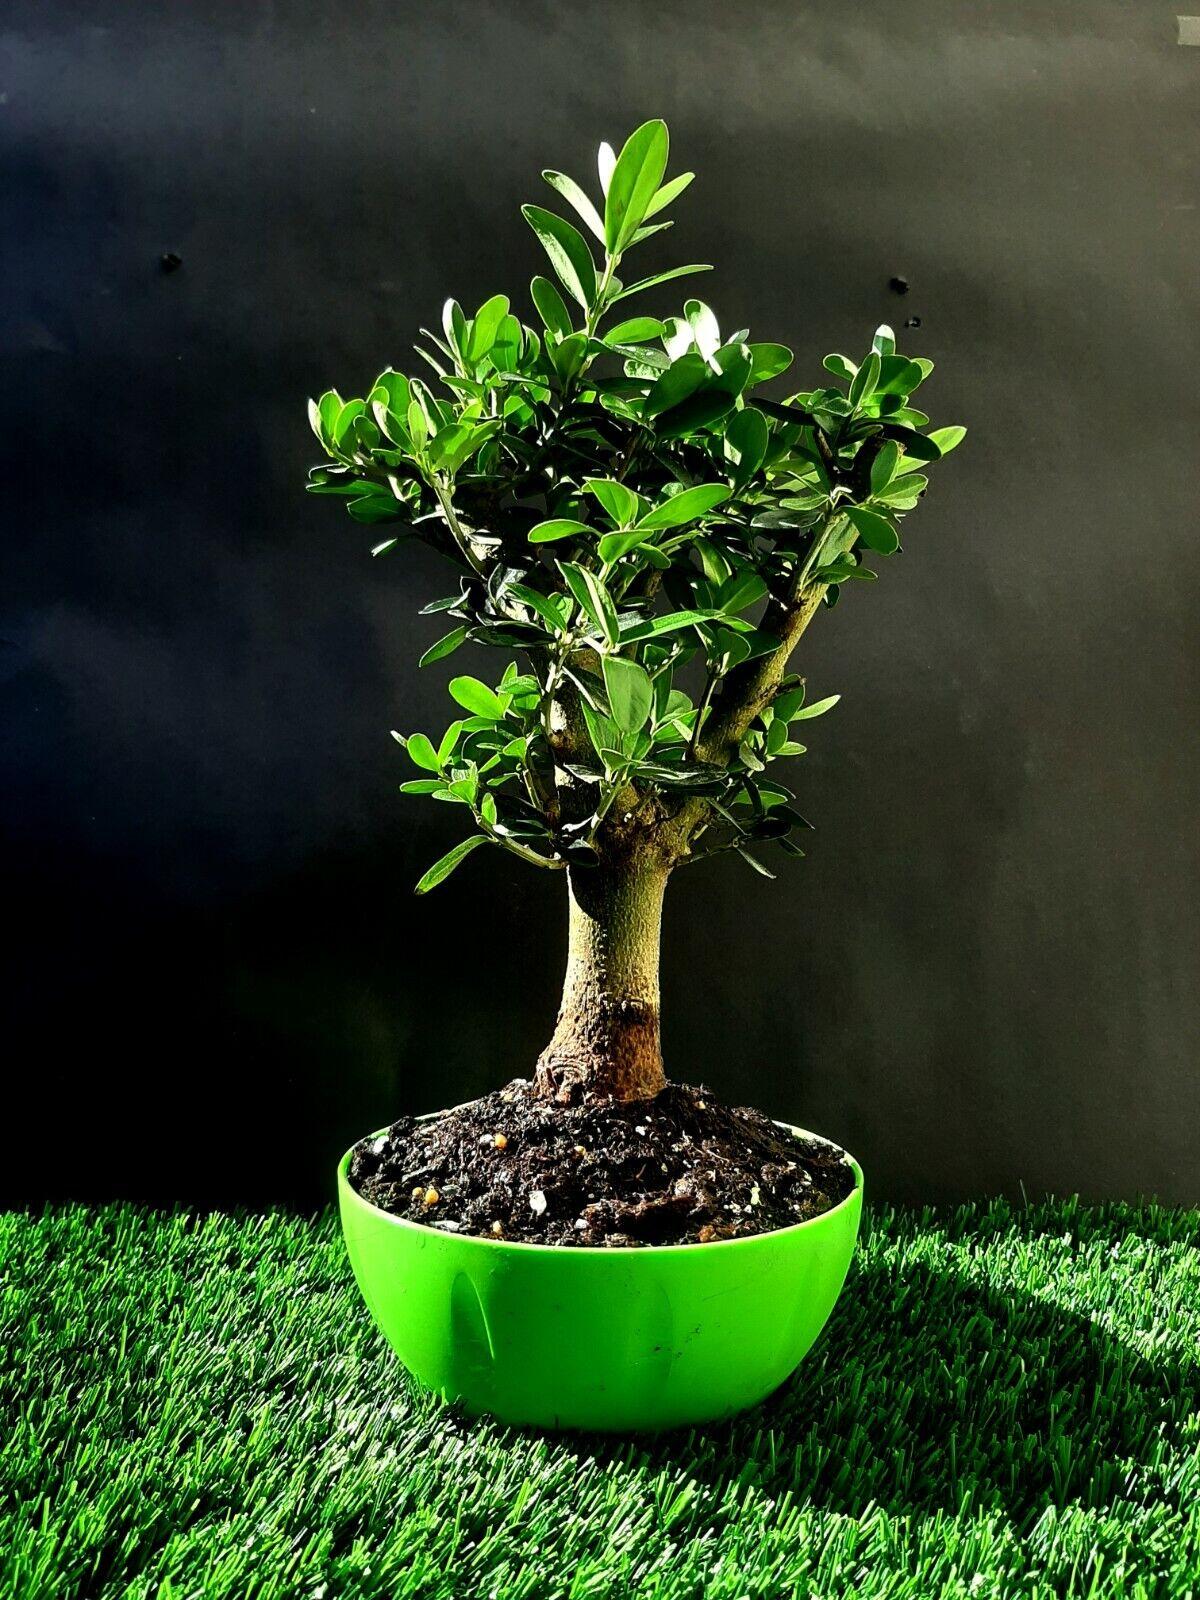 Olive tree Bonsai - Amazing tree